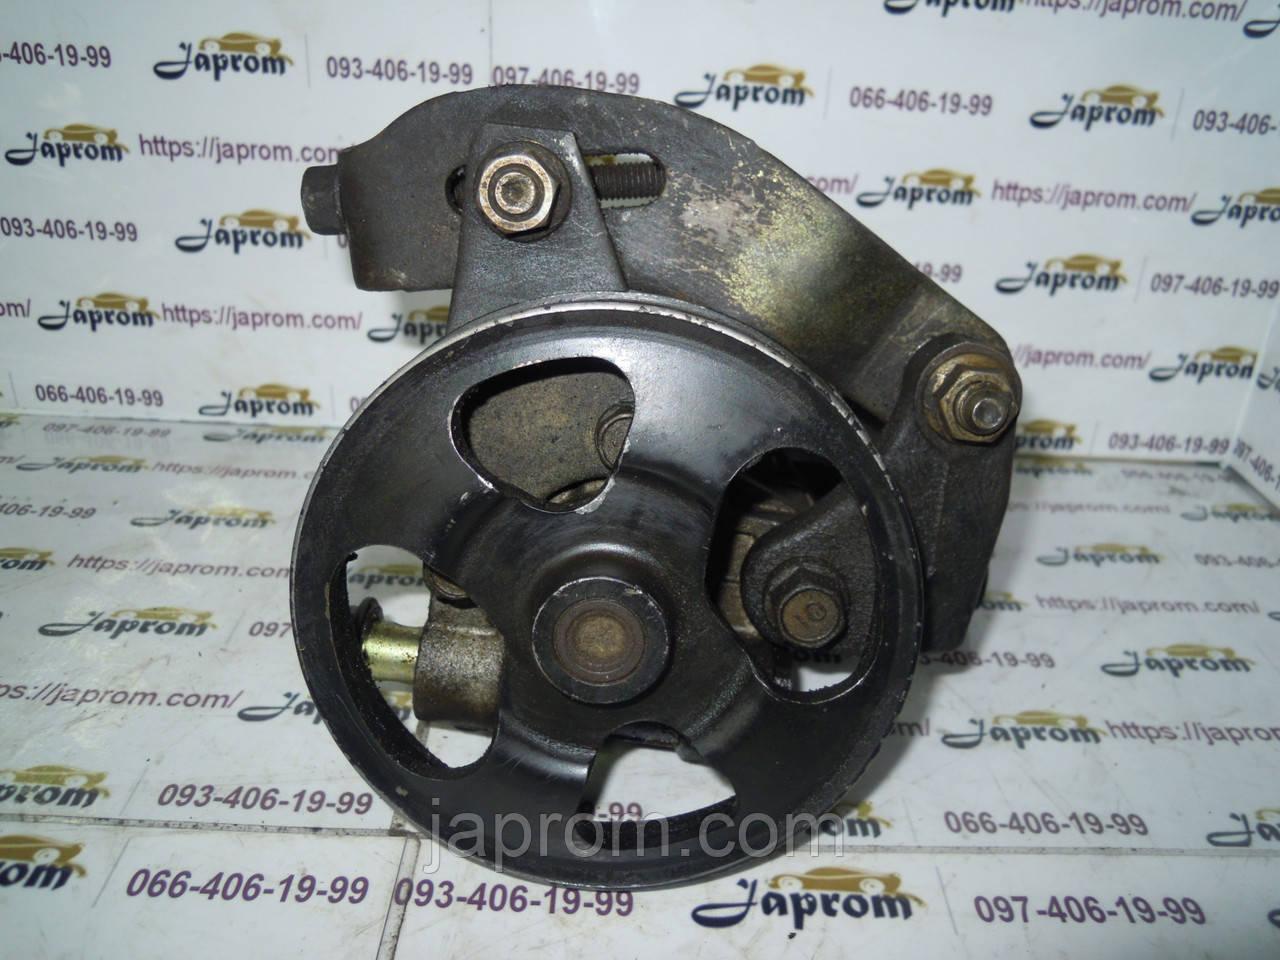 Насос гидроусилителя руля Mazda 323 BJ 1994-2002г.в 1.3 1.5 1.6 бензин KYB